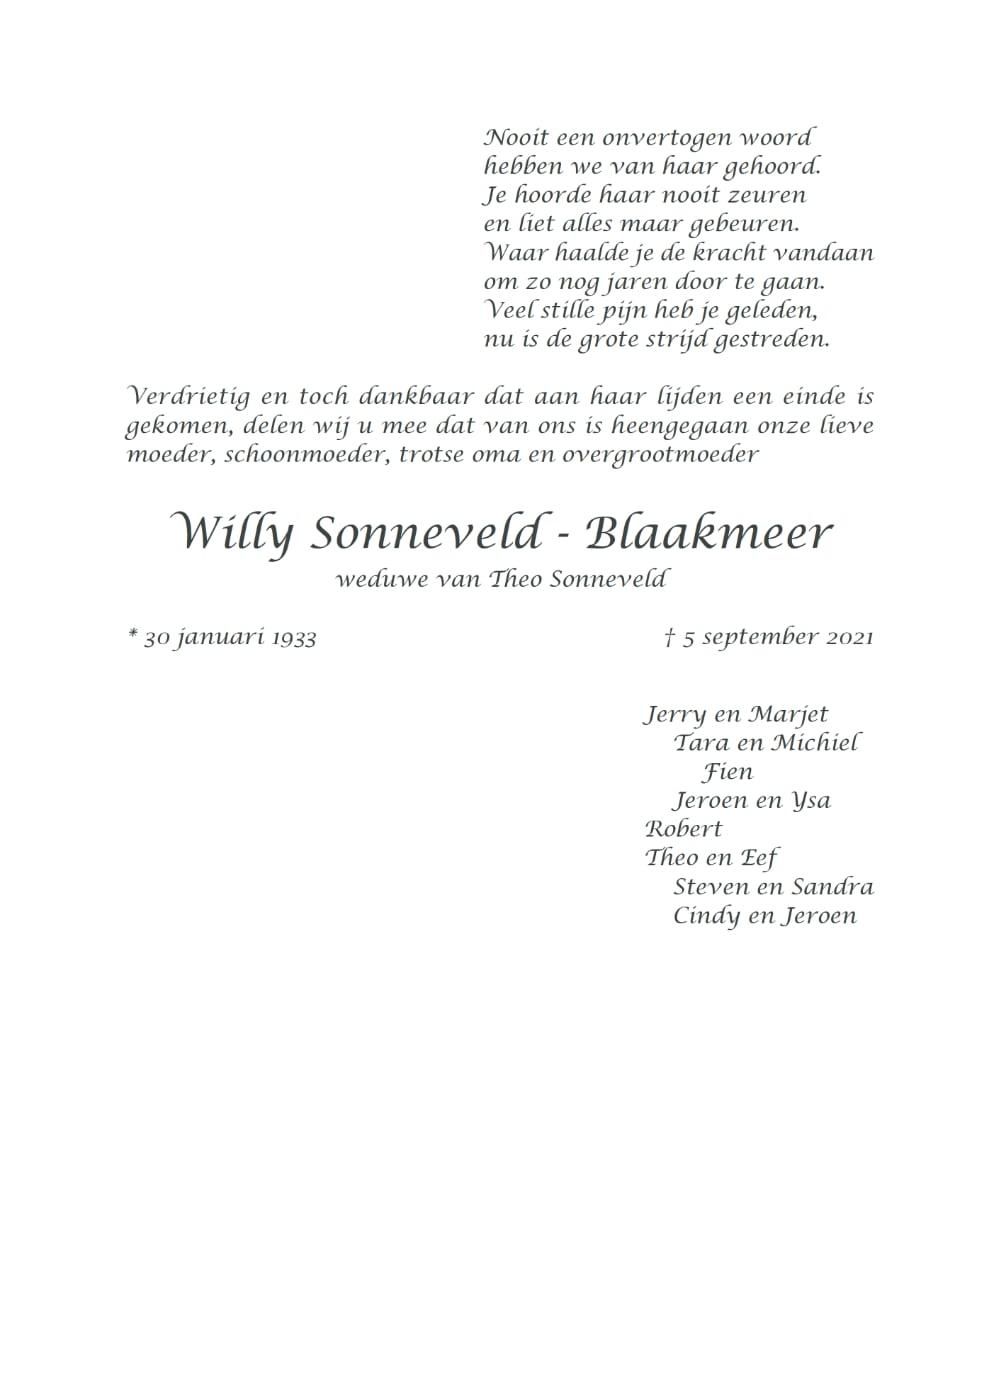 Rouwkaart midden Willy Sonneveld - Blaakmeer